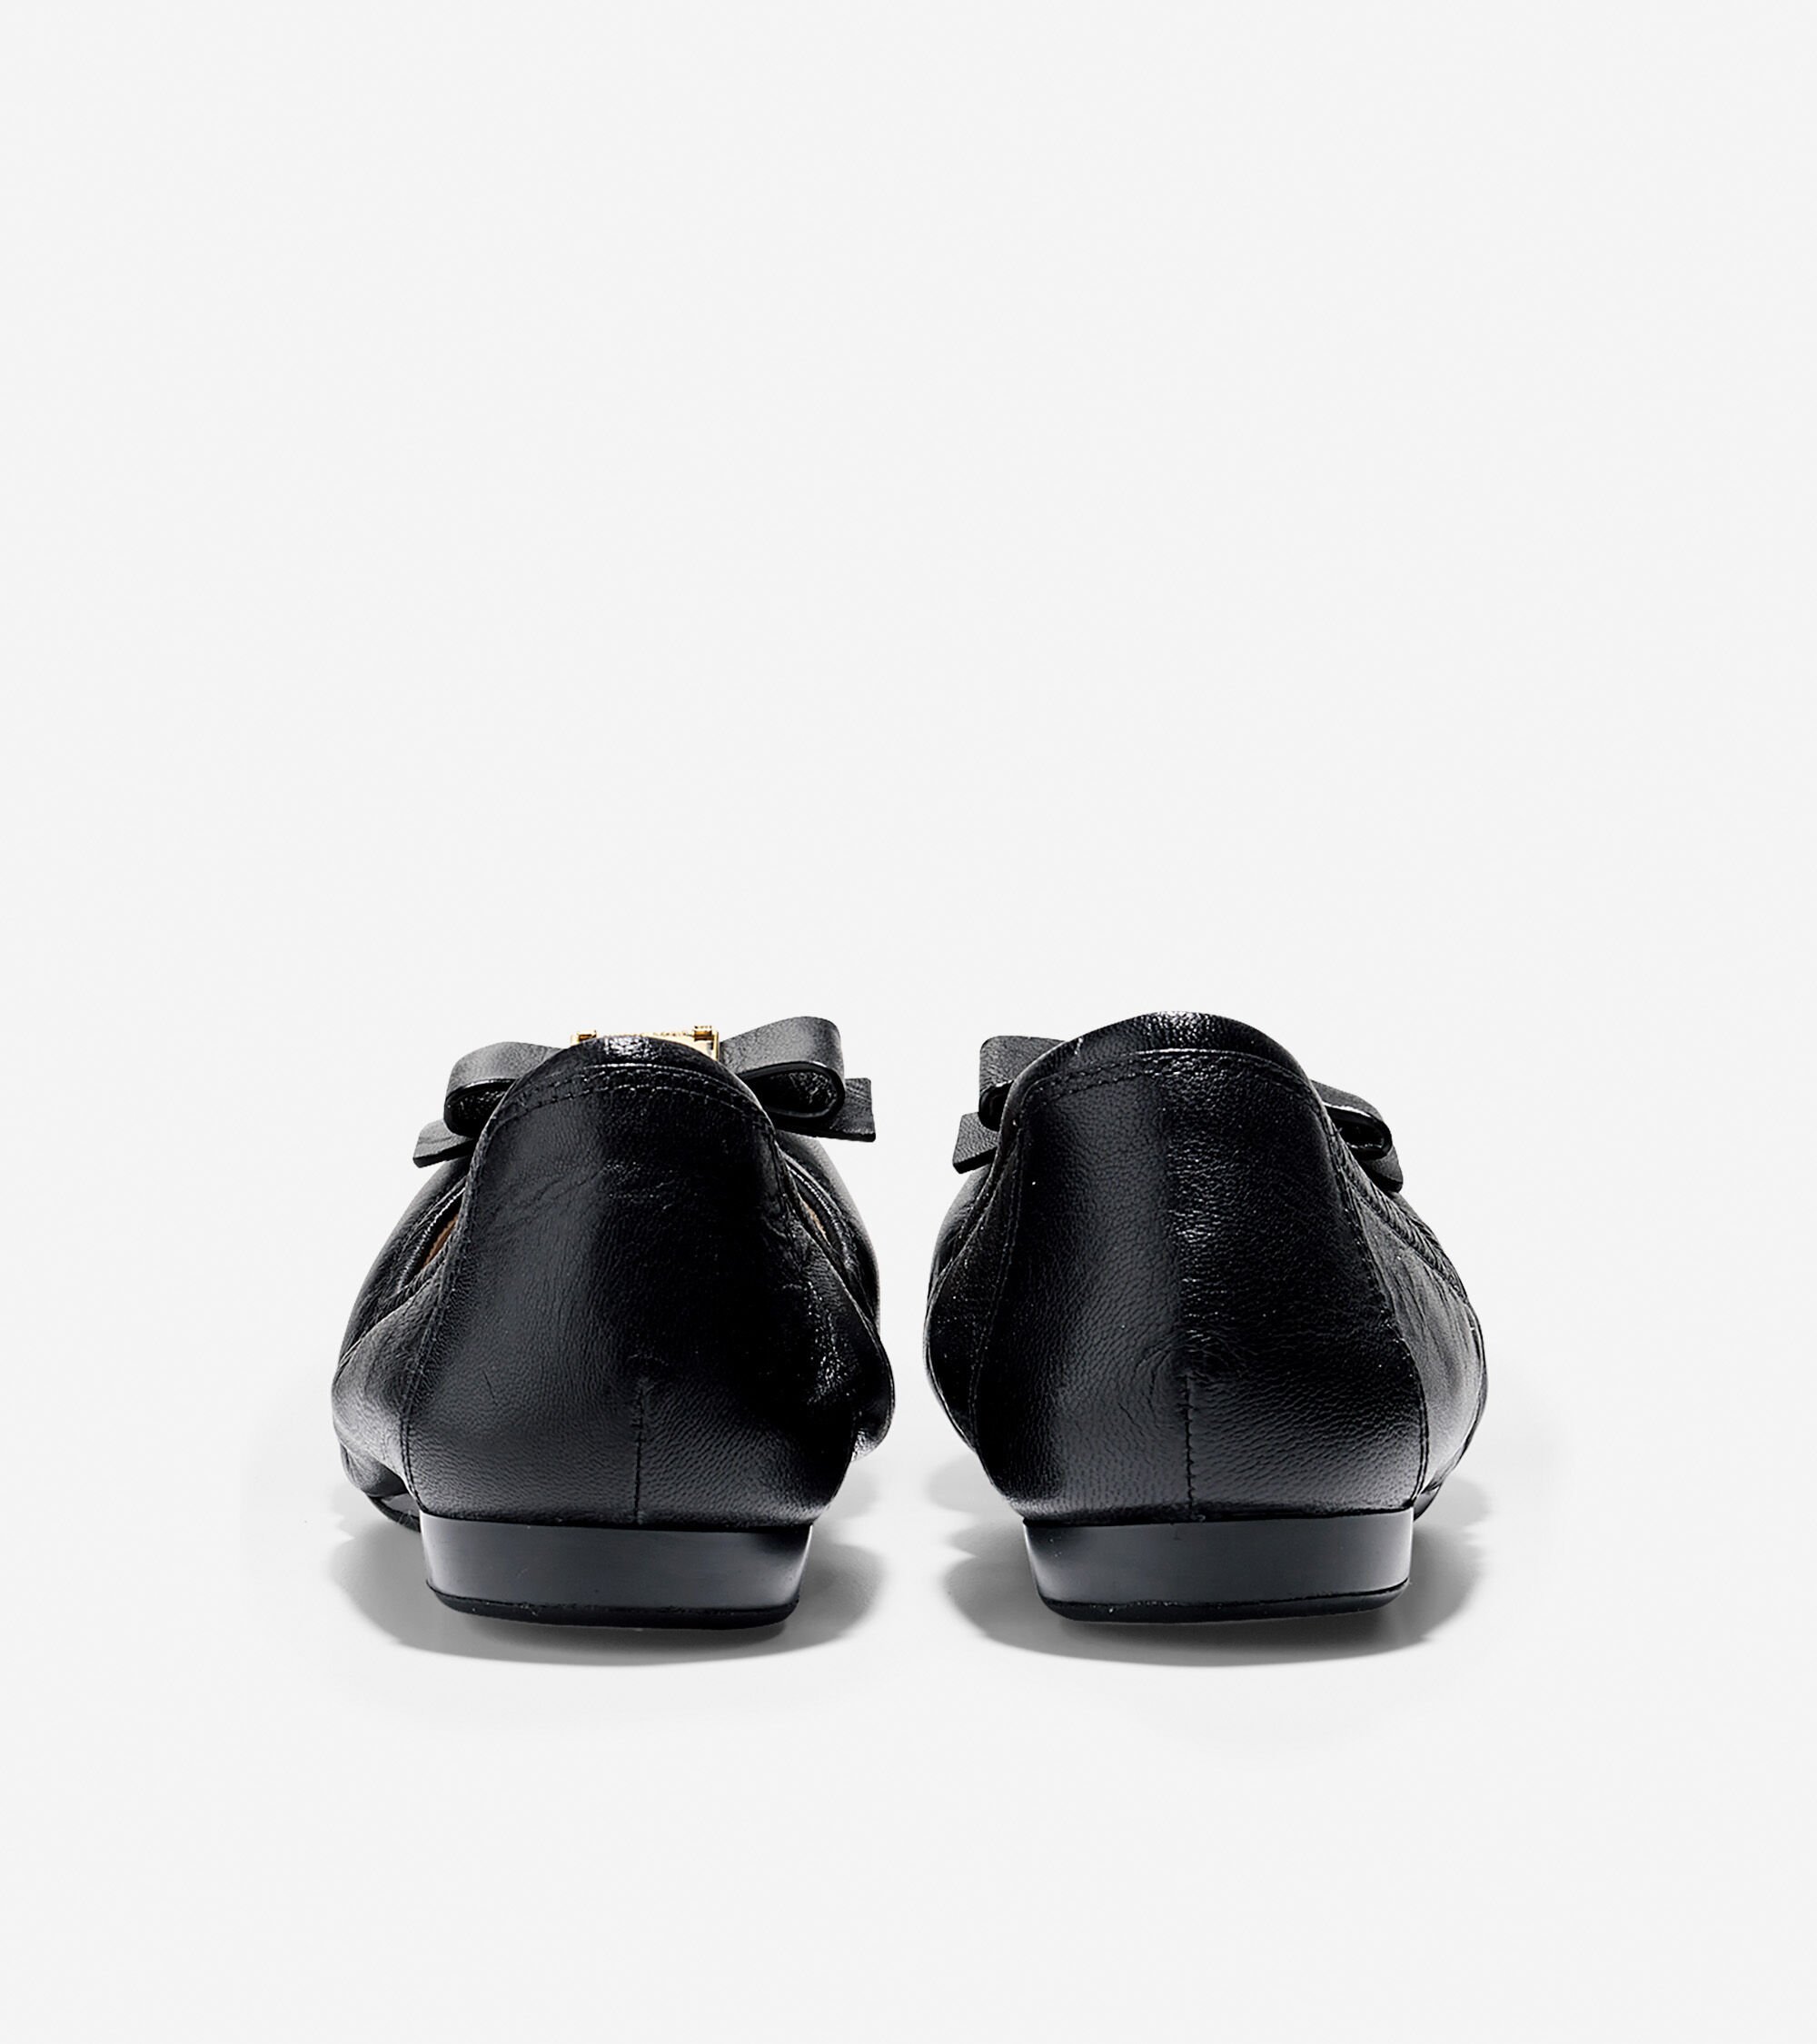 c4065ade17cf Women s Tali Bow Ballet Flats in Black